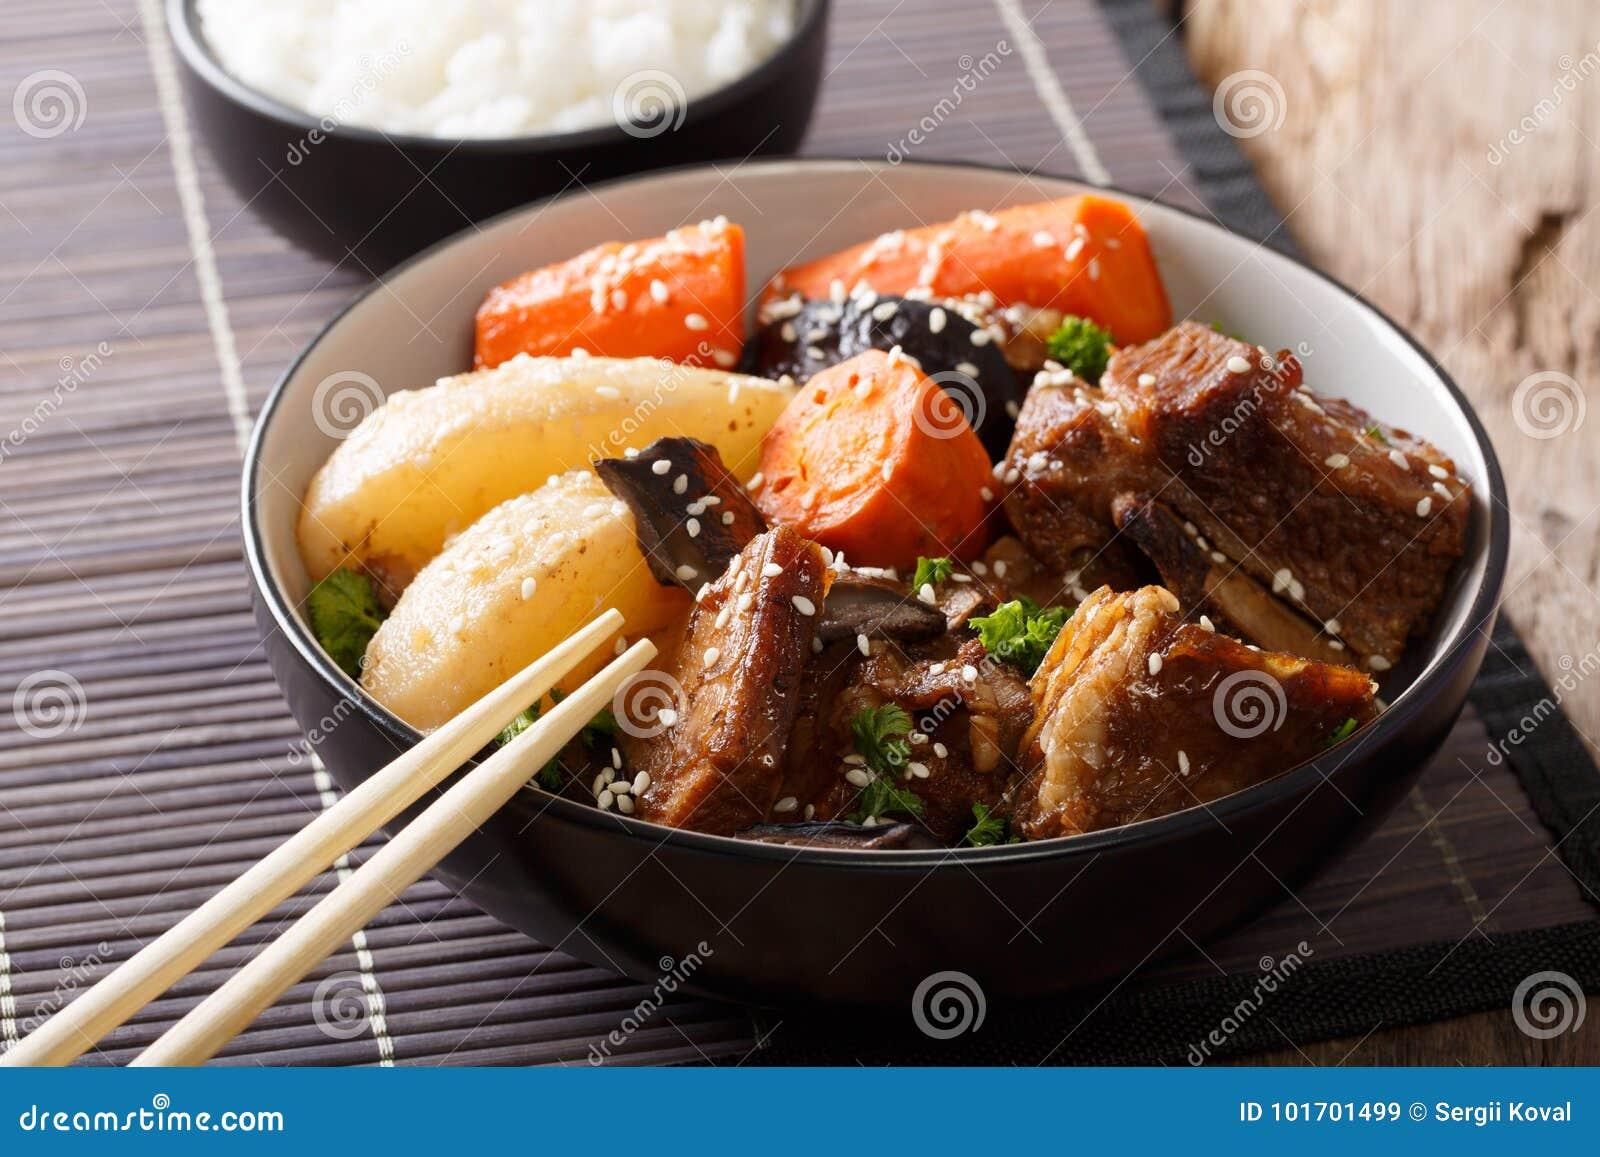 Galbi jjim Korean Braised Beef Short Ribs with rice close-up. Ho